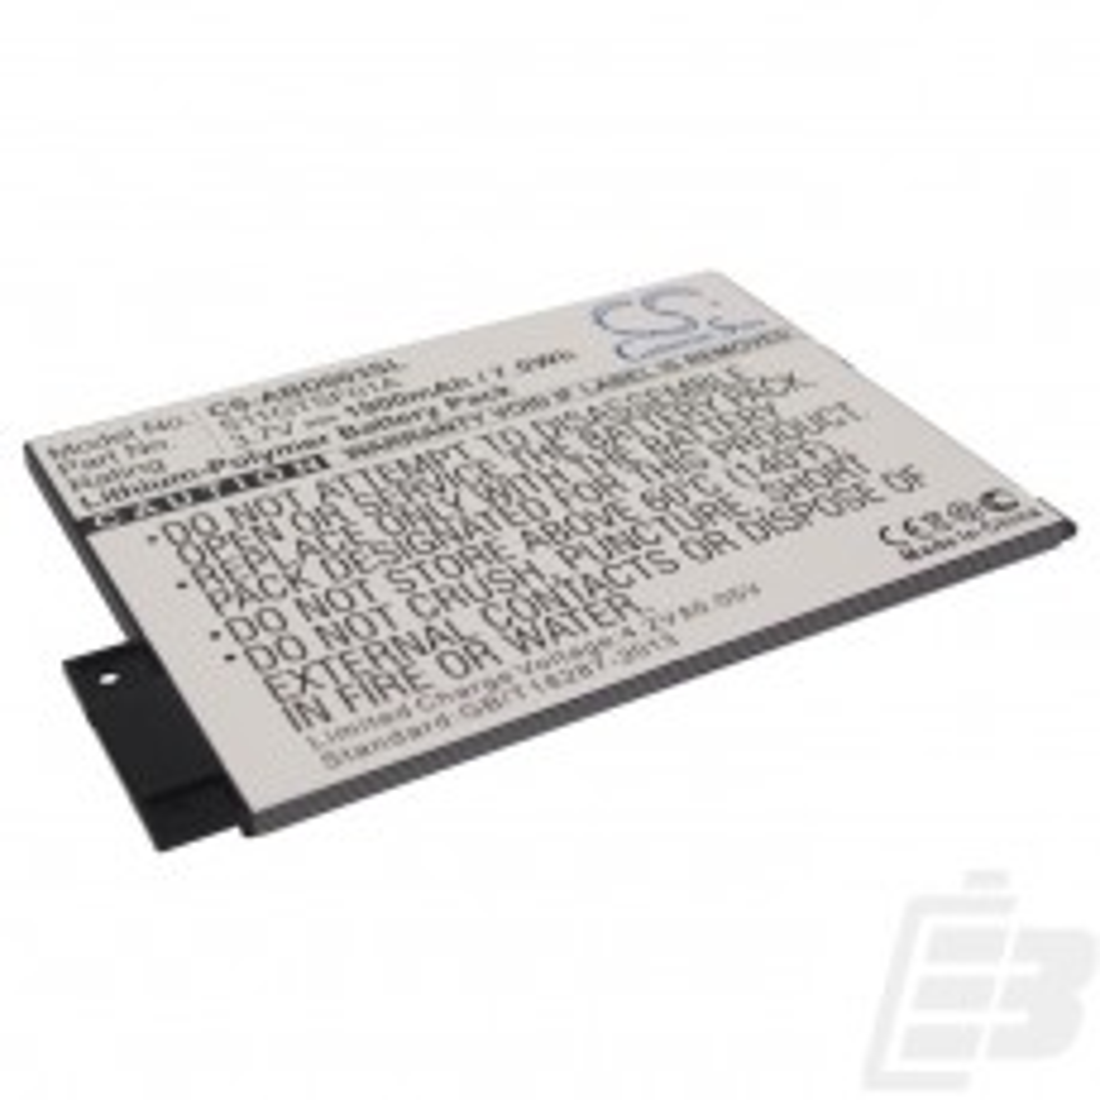 E-book reader battery Amazon Kindle 3_1